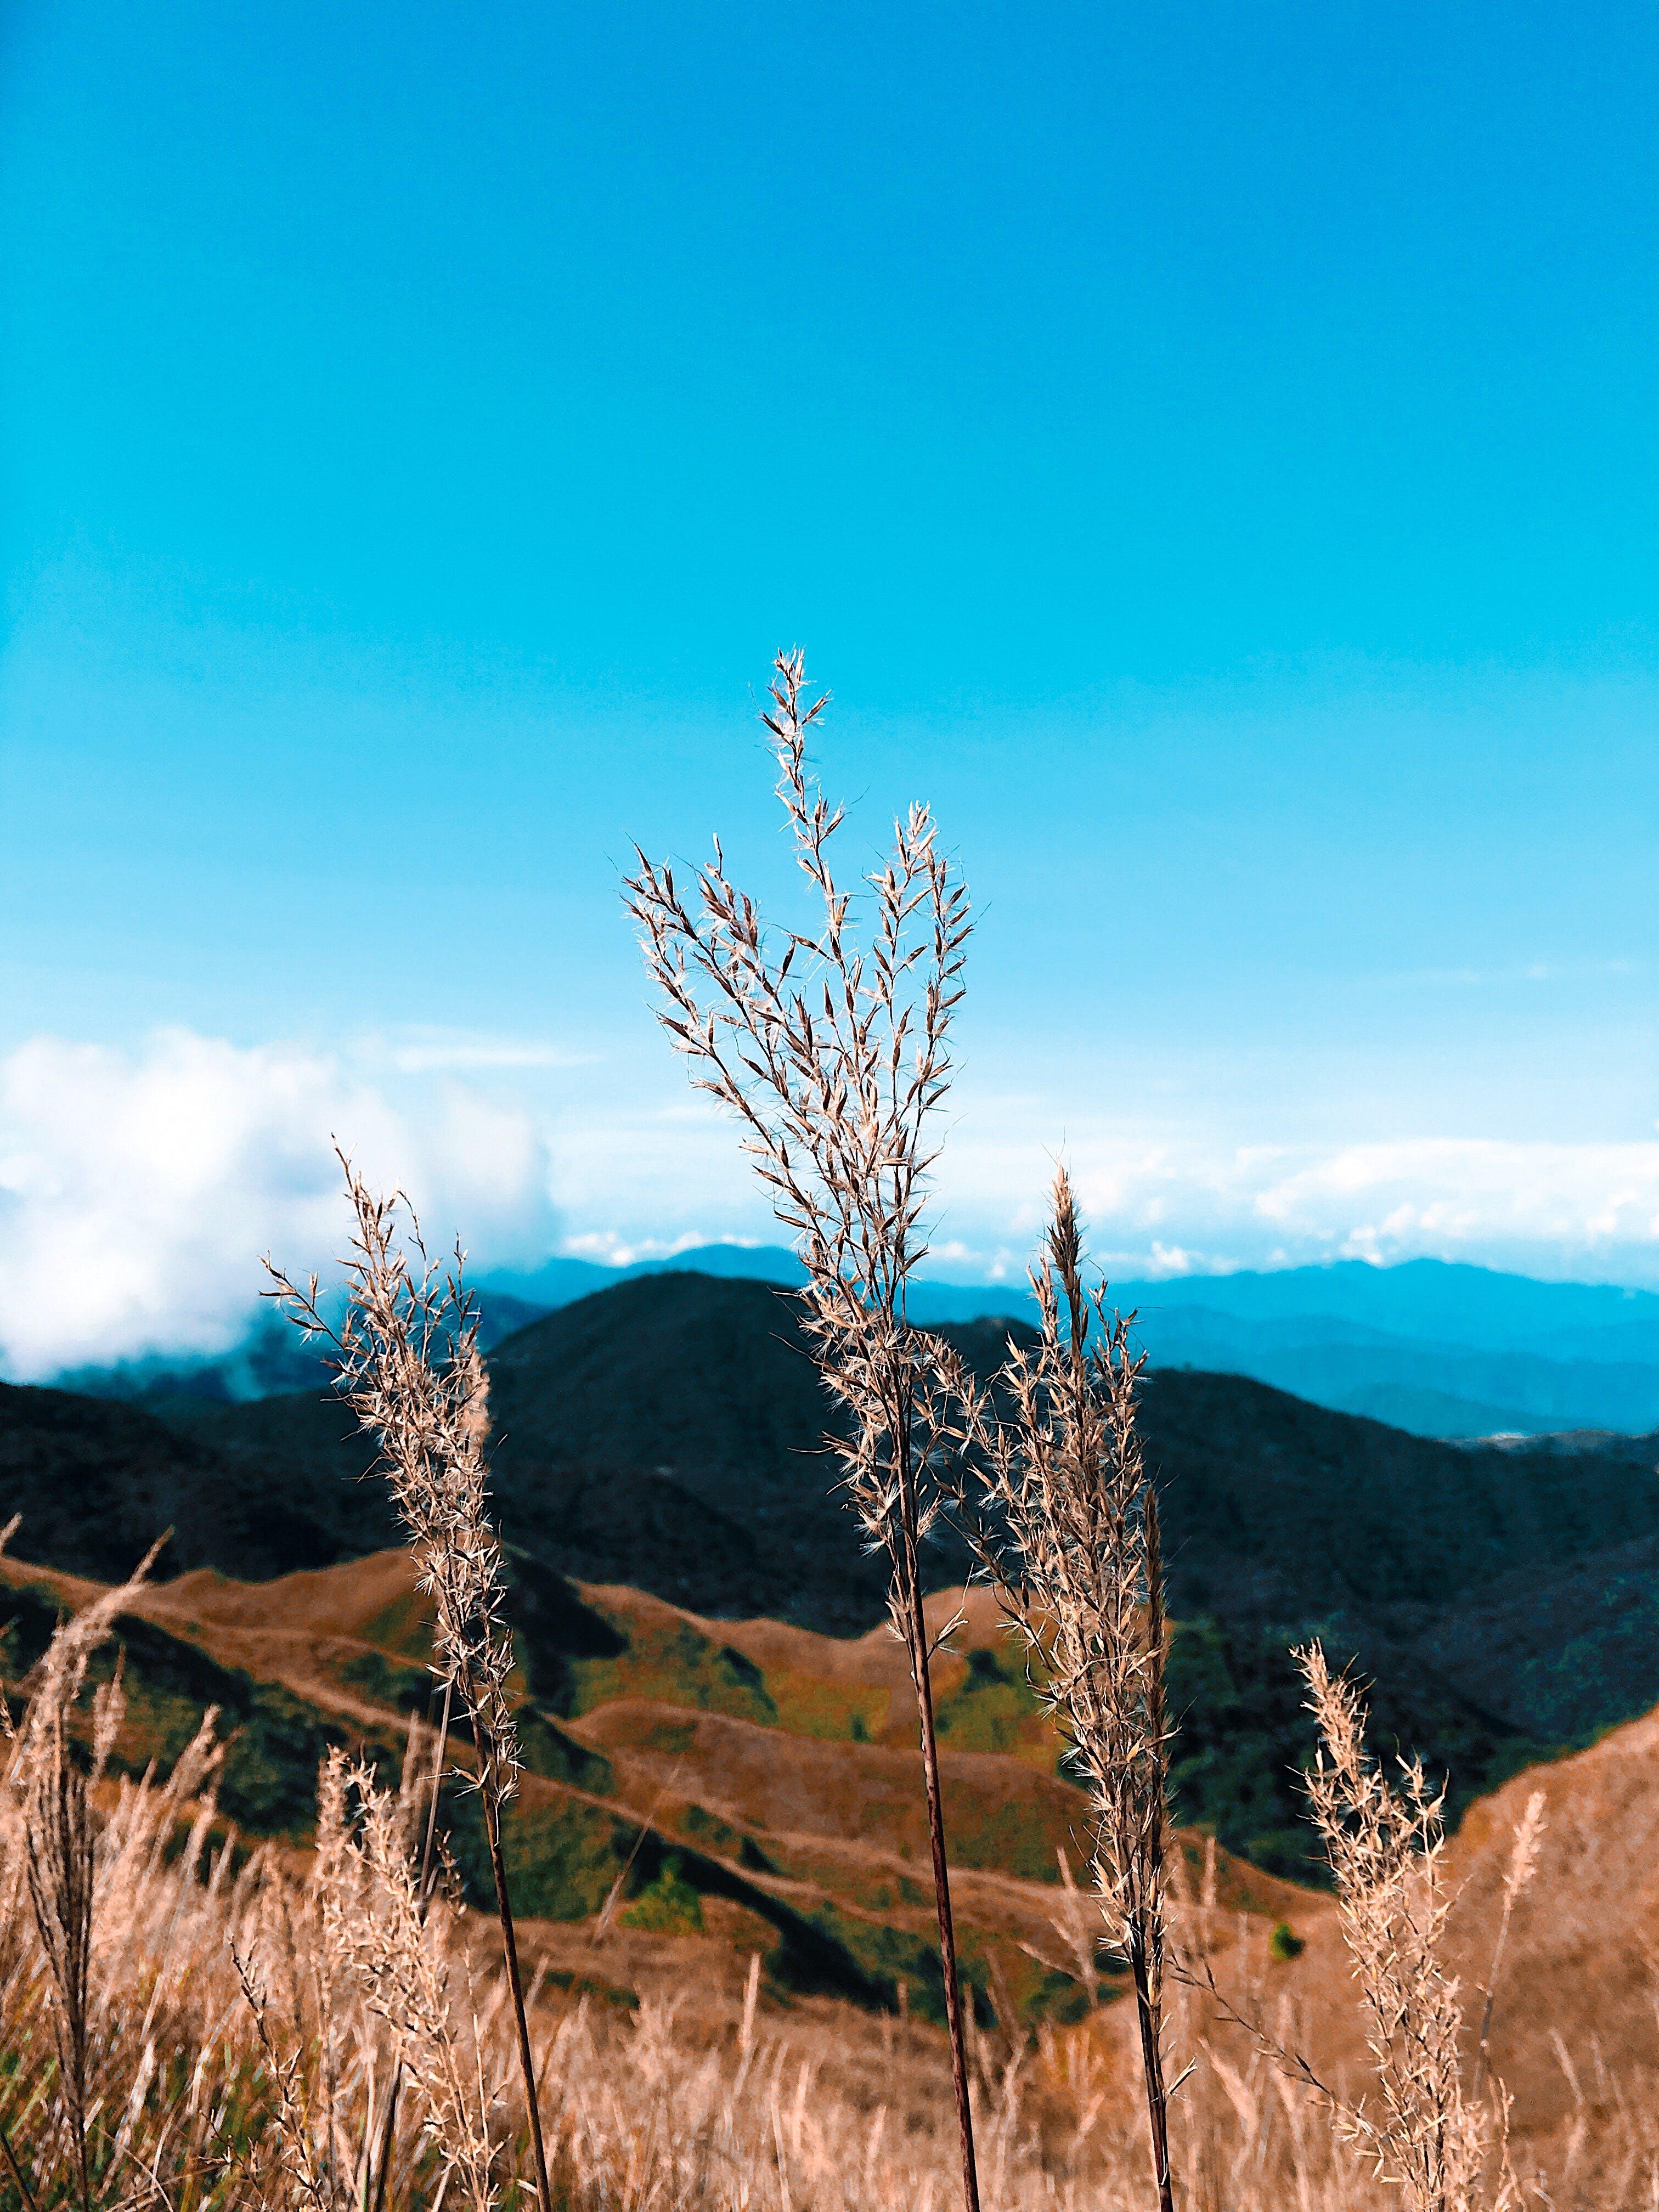 Focus Photo of Brown Plants on Mountain Range